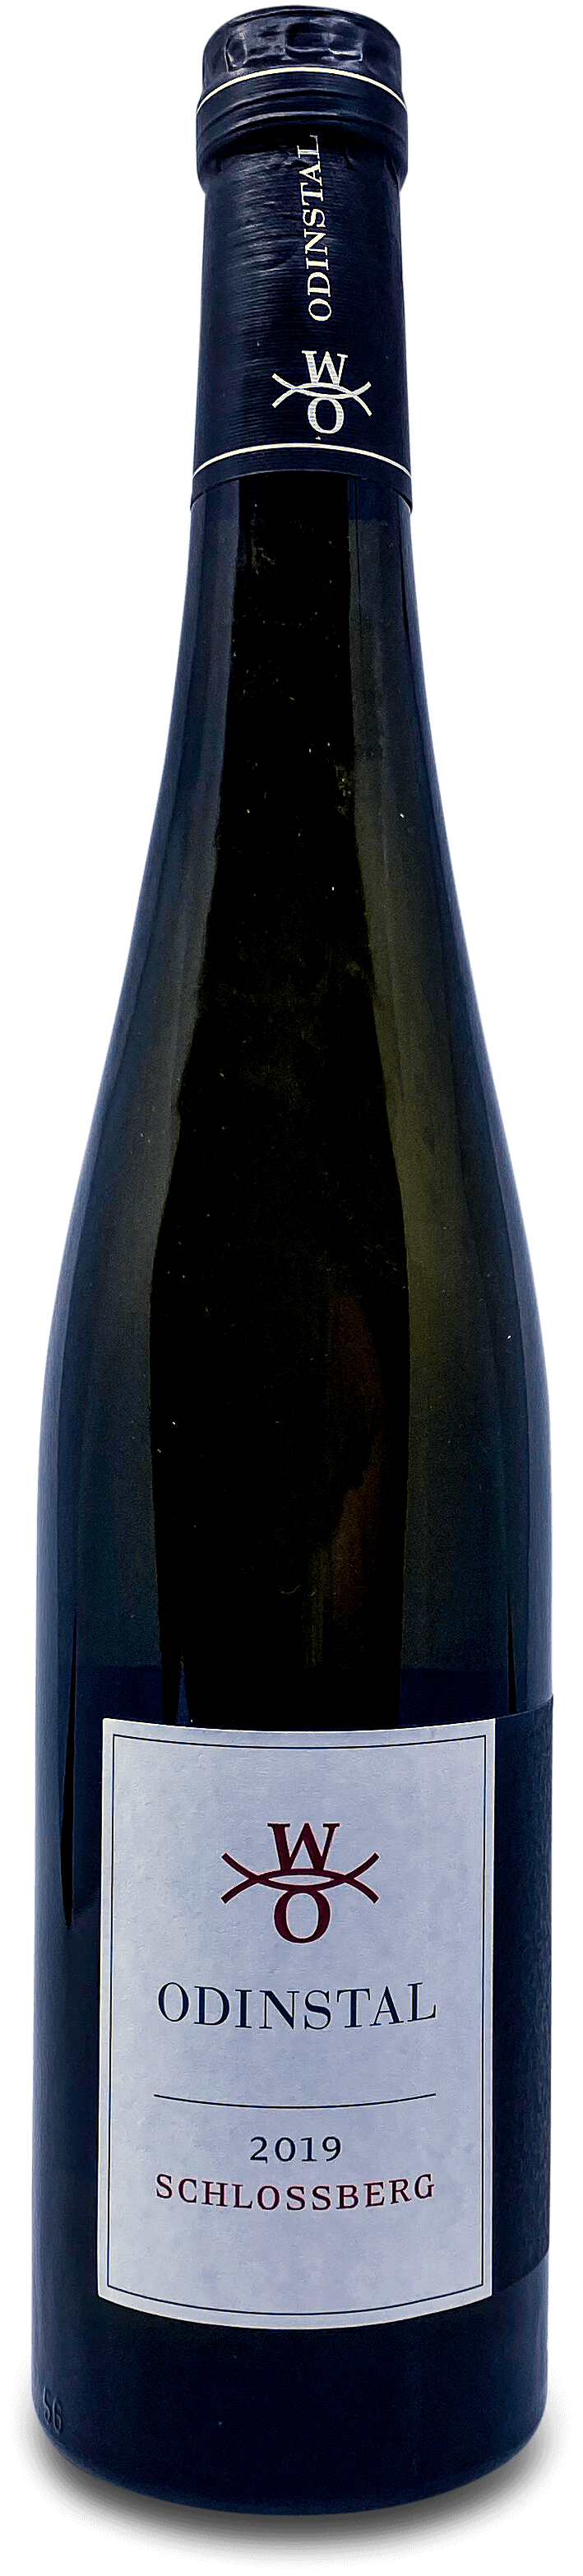 Schlossberg Rieslaner - Vinsupernaturel